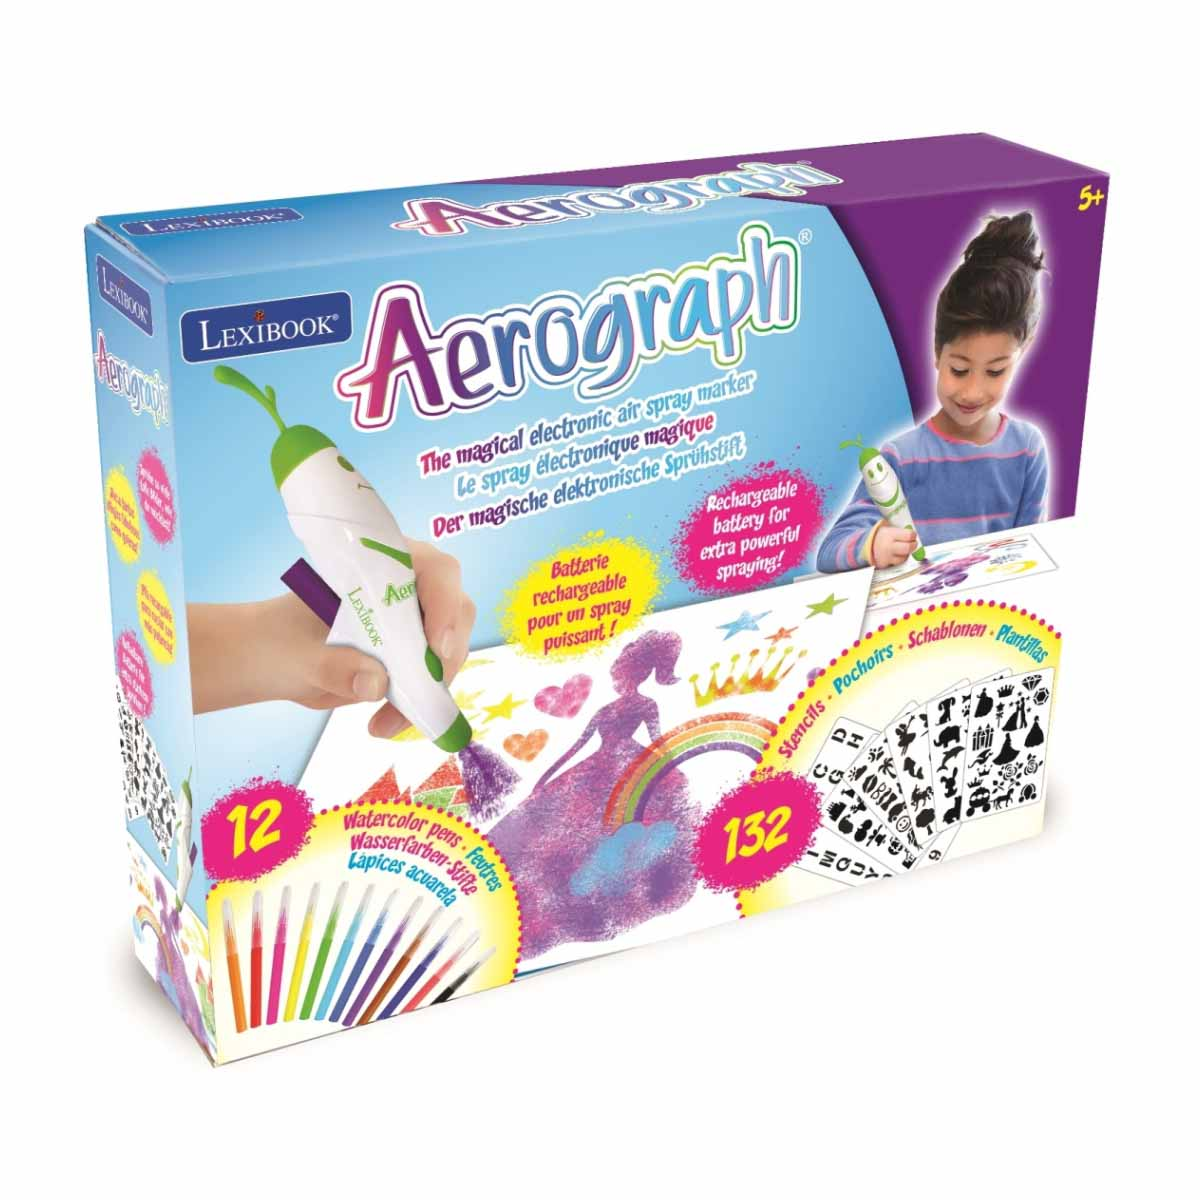 Jucarie interactiva Lexibook, Marker eletronic Aerografh, 12 culori